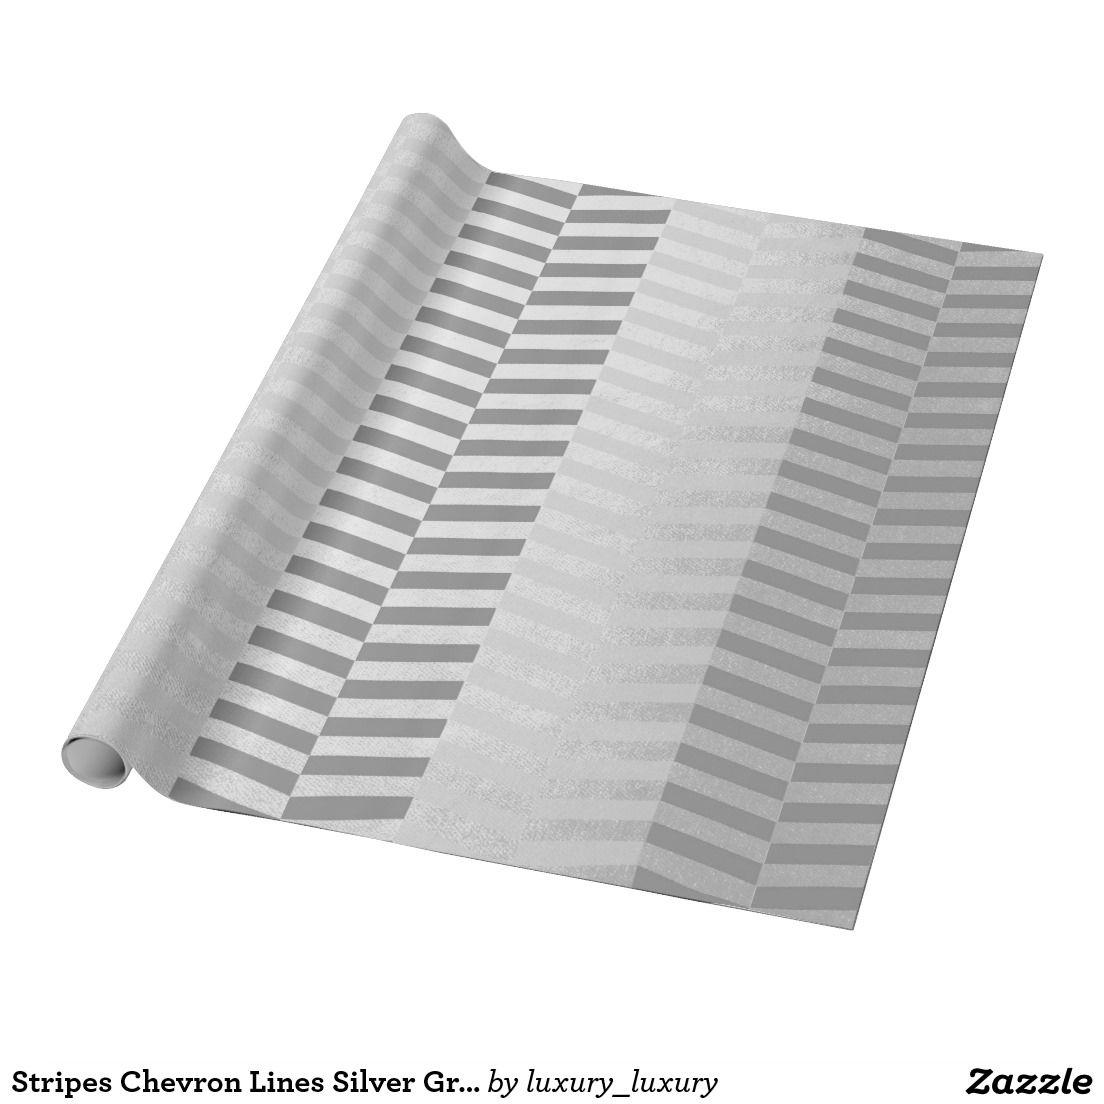 Stripes Chevron Lines Silver Graphite Vip Gray Wrapping Paper